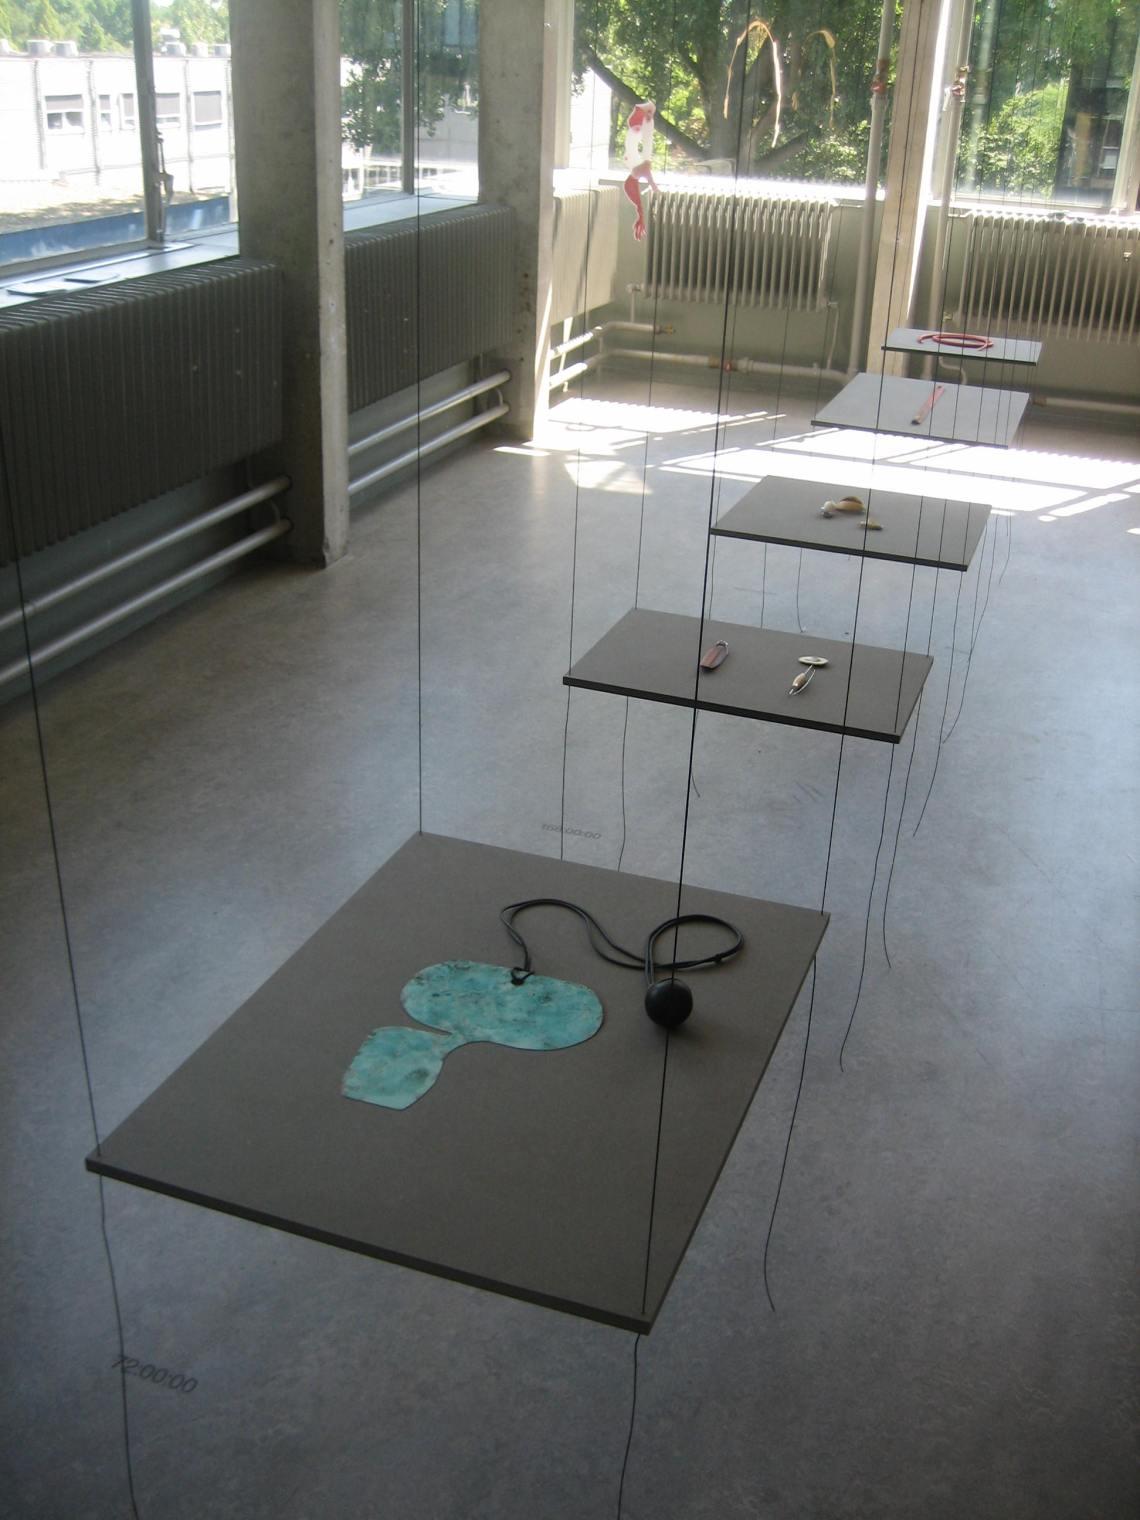 Graduation Show, Gerrit Rietveld Academie. Foto Esther Doornbusch, juli 2018©